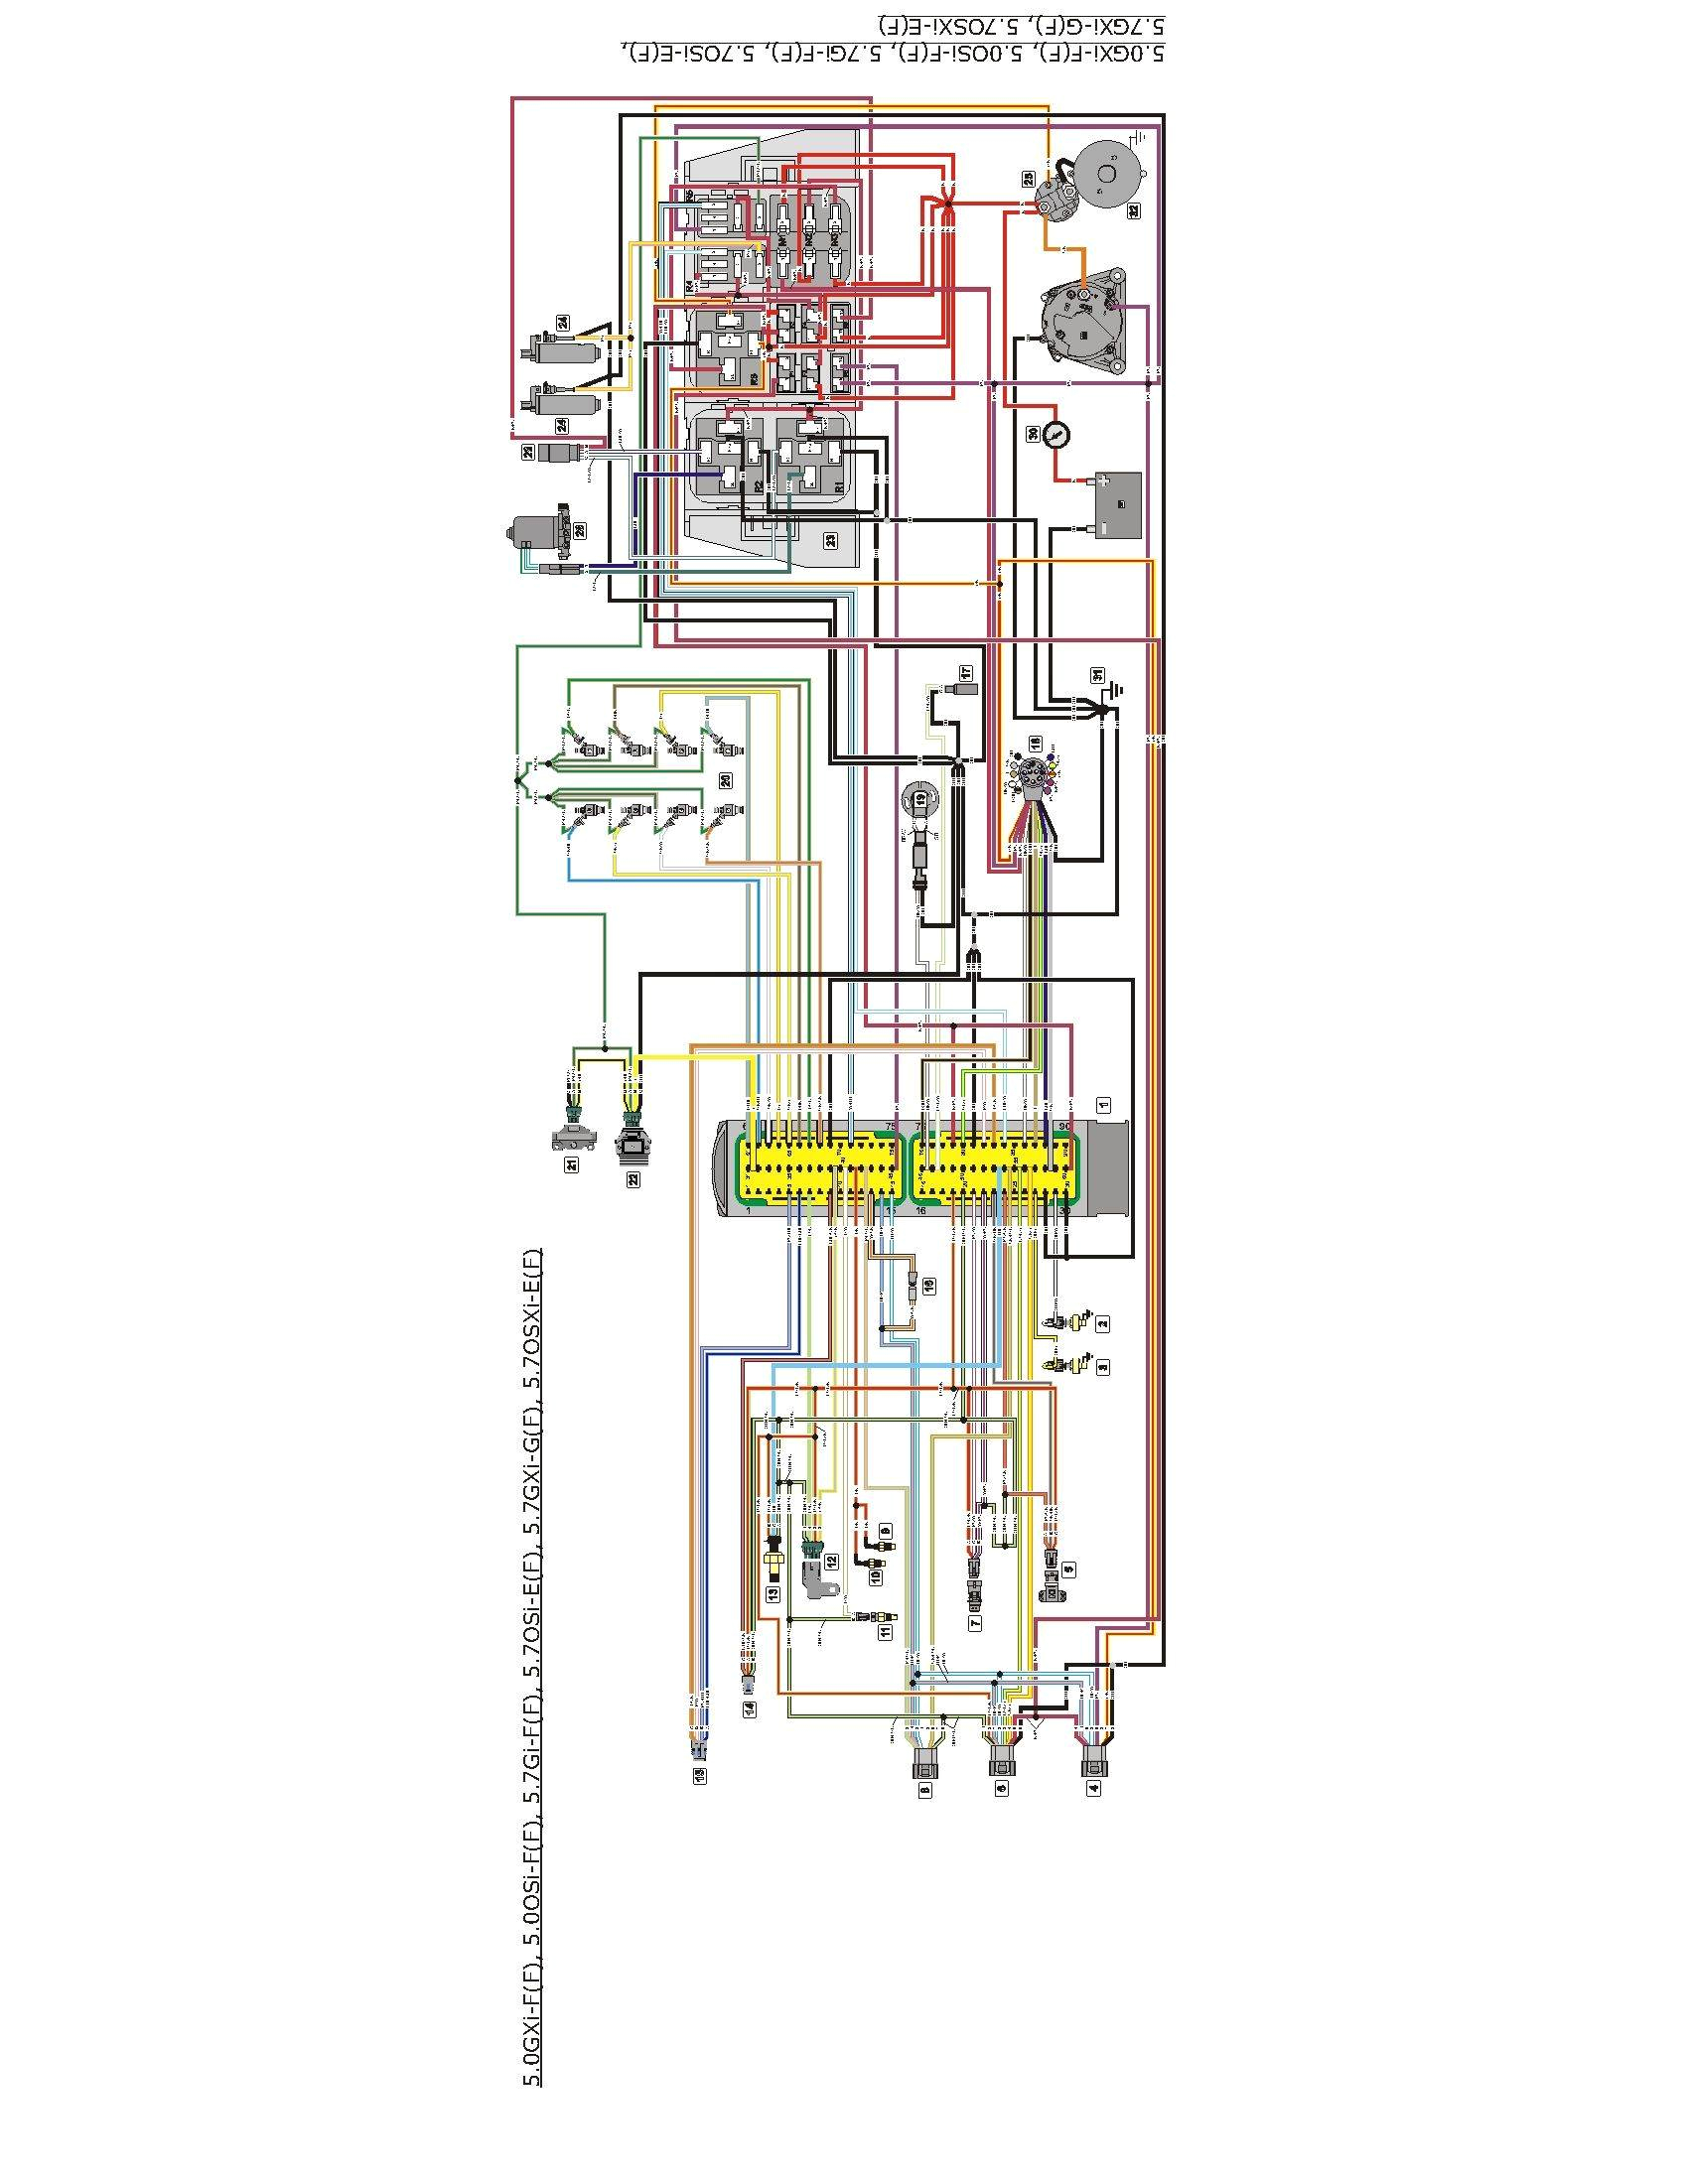 Mercruiser 5.7 Alternator Wiring Diagram Volvo Penta Engine Diagram Wiring Diagram Details